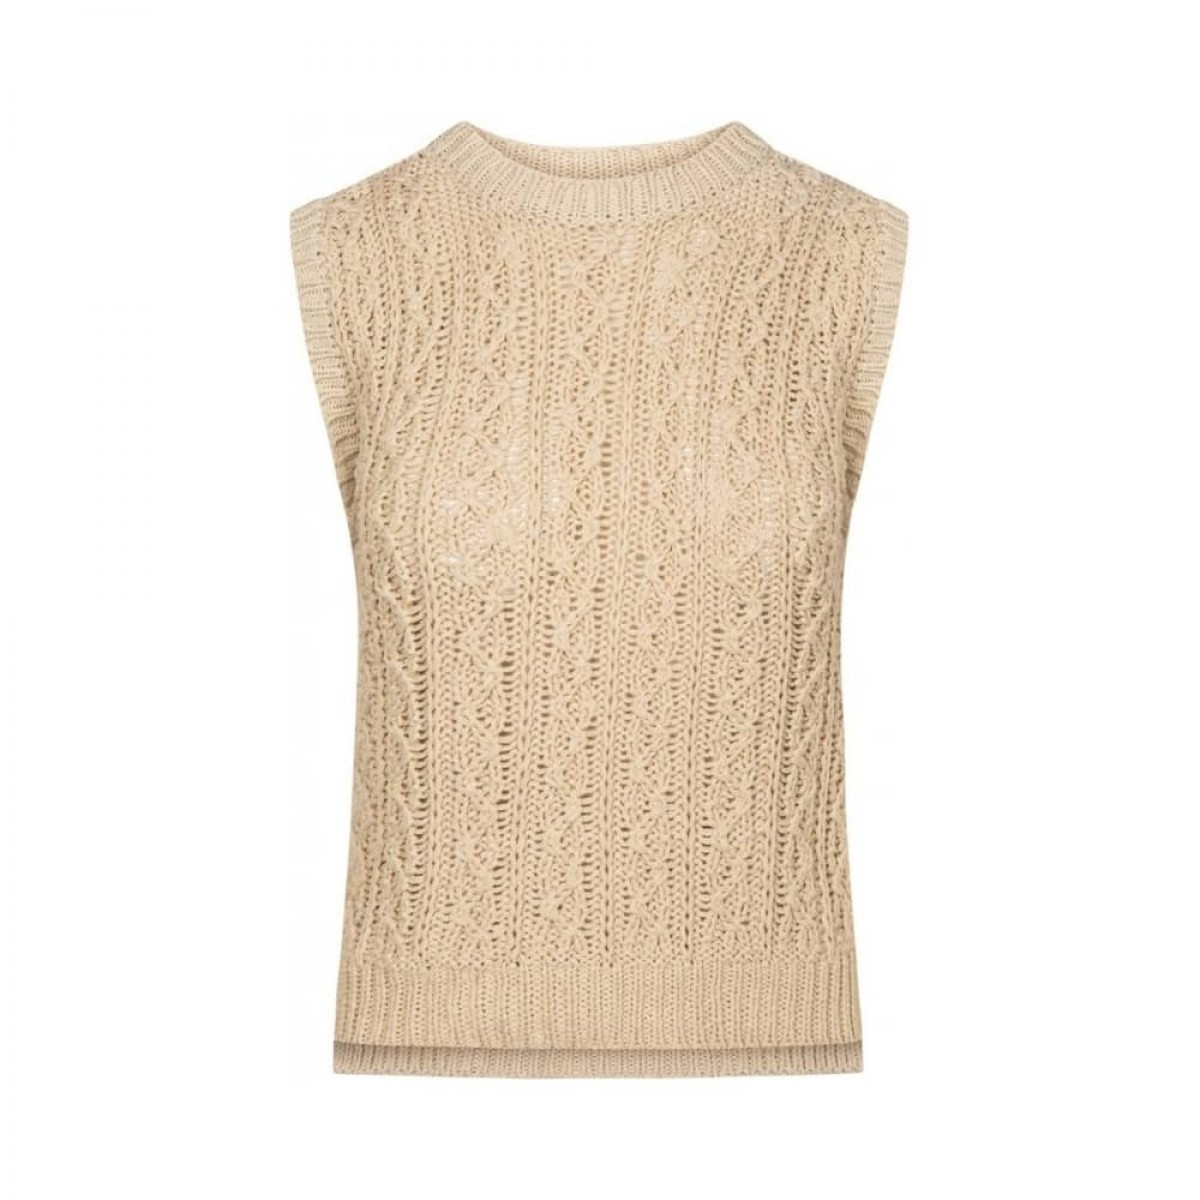 othilia vest - off white - front